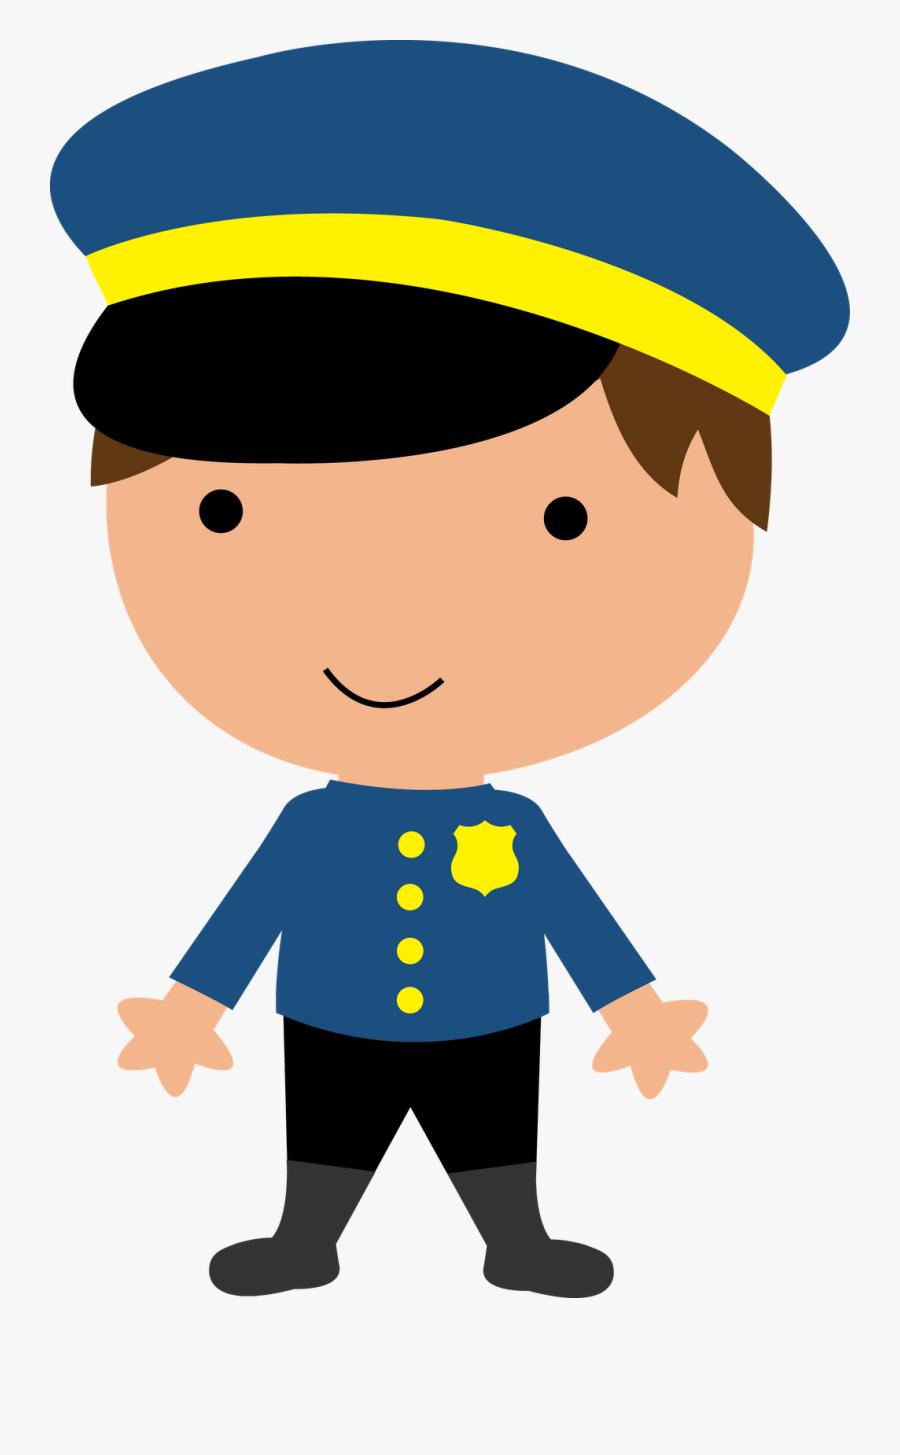 Police Clipart Boy - Policial Desenho Png, Transparent Clipart